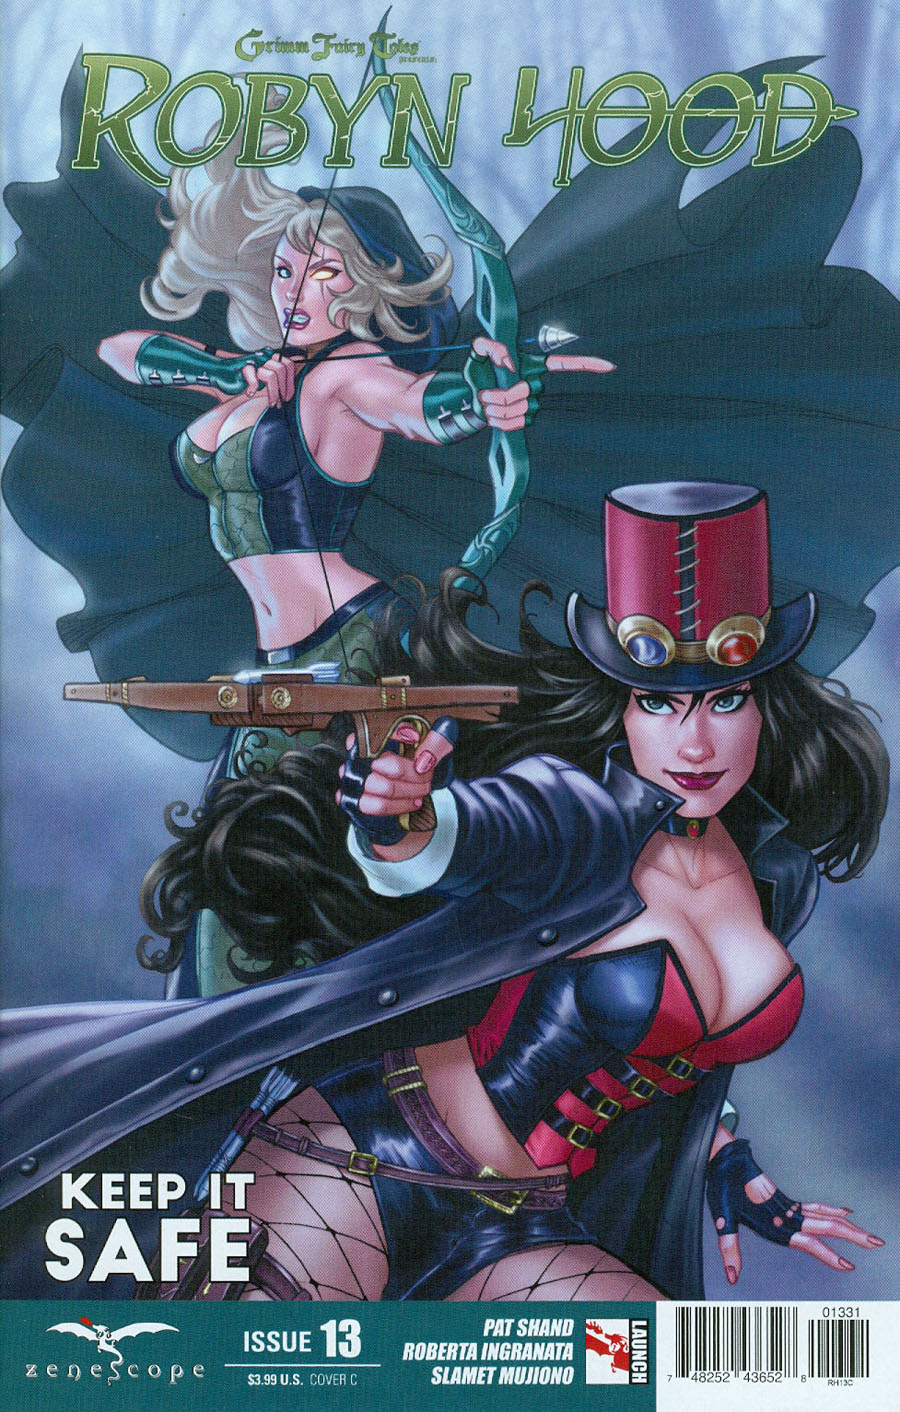 Grimm Fairy Tales Presents Robyn Hood Vol 2 #13 Cover C Maria Sanapo